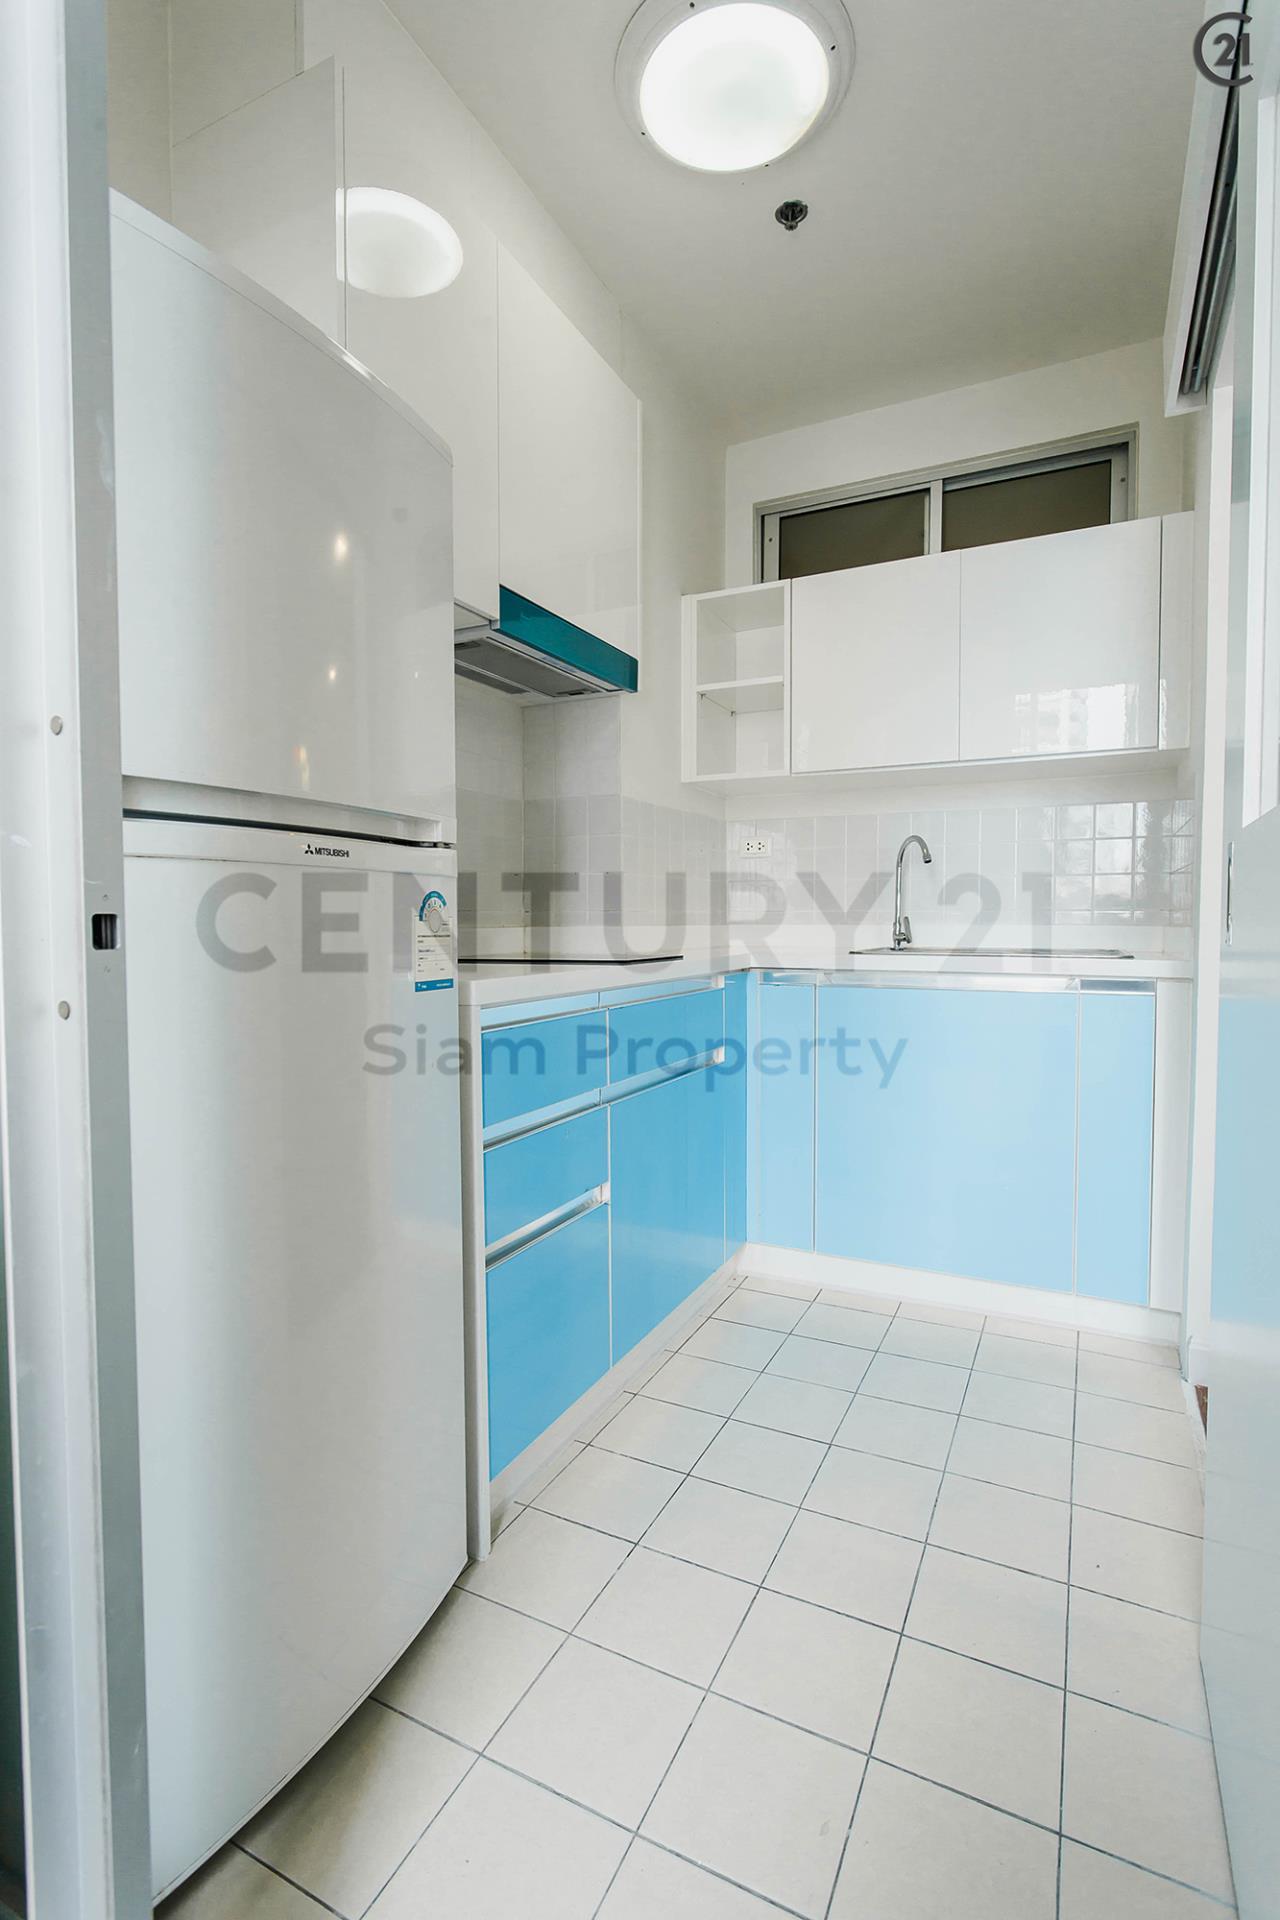 Century21 Siam Property Agency's Condo One X Sukhumvit 26 16